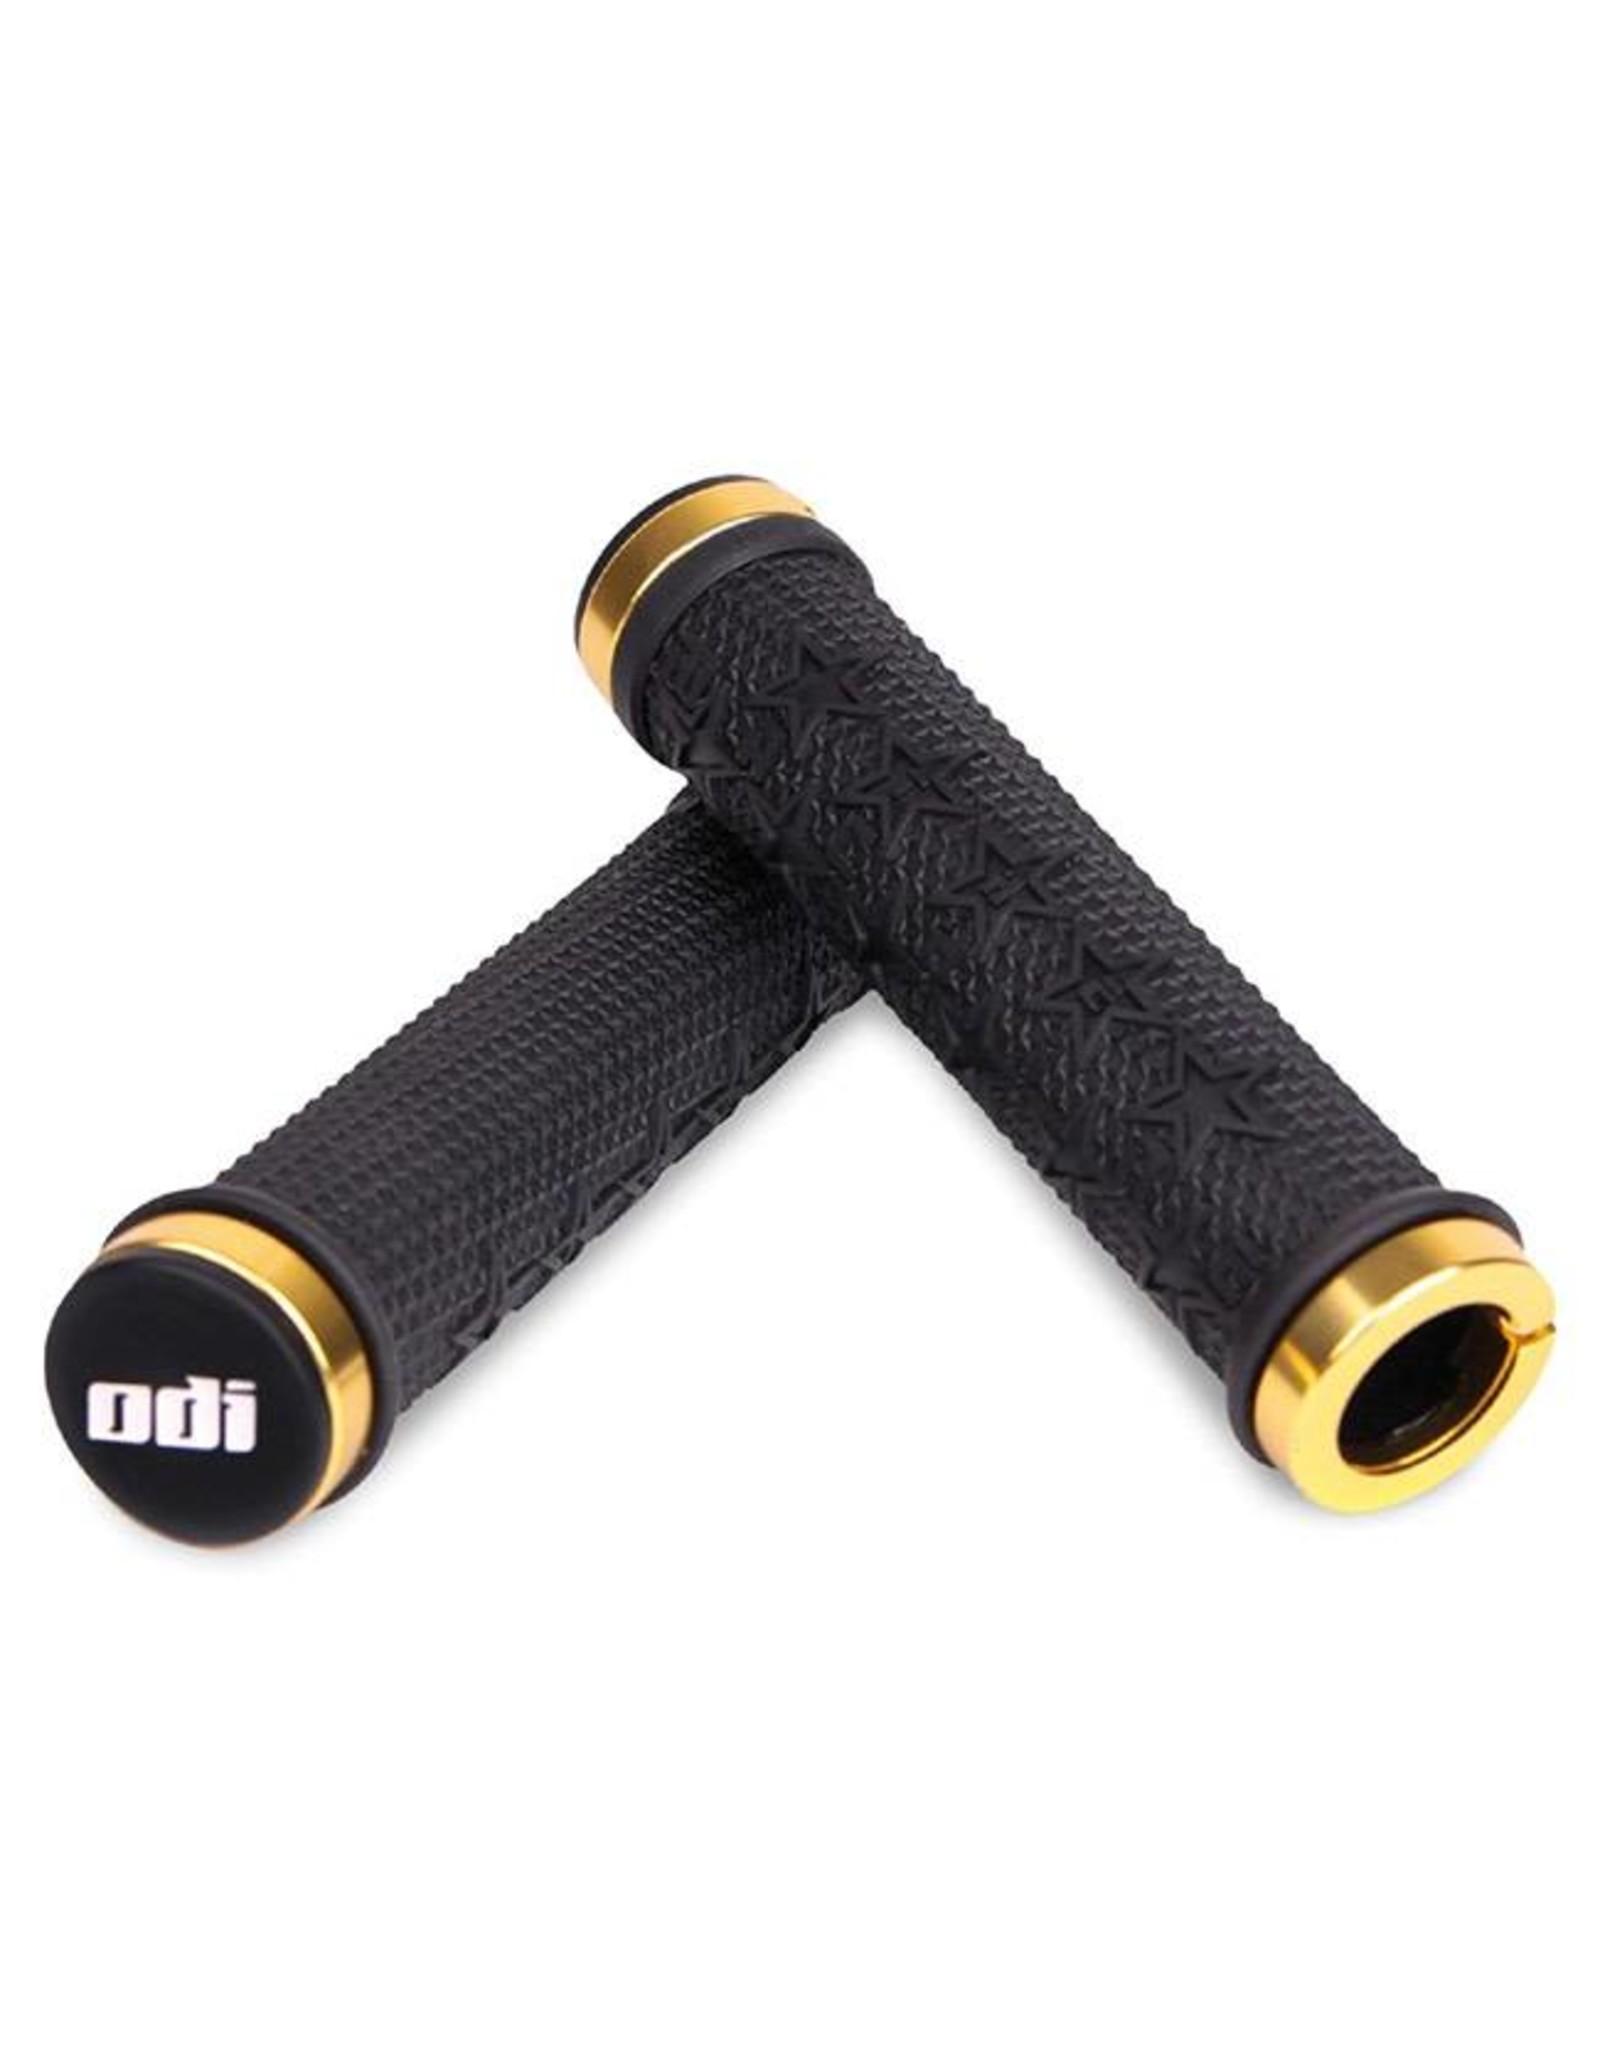 ODI ODI The Machine Lock-On Grips Black w/Gold Clamps